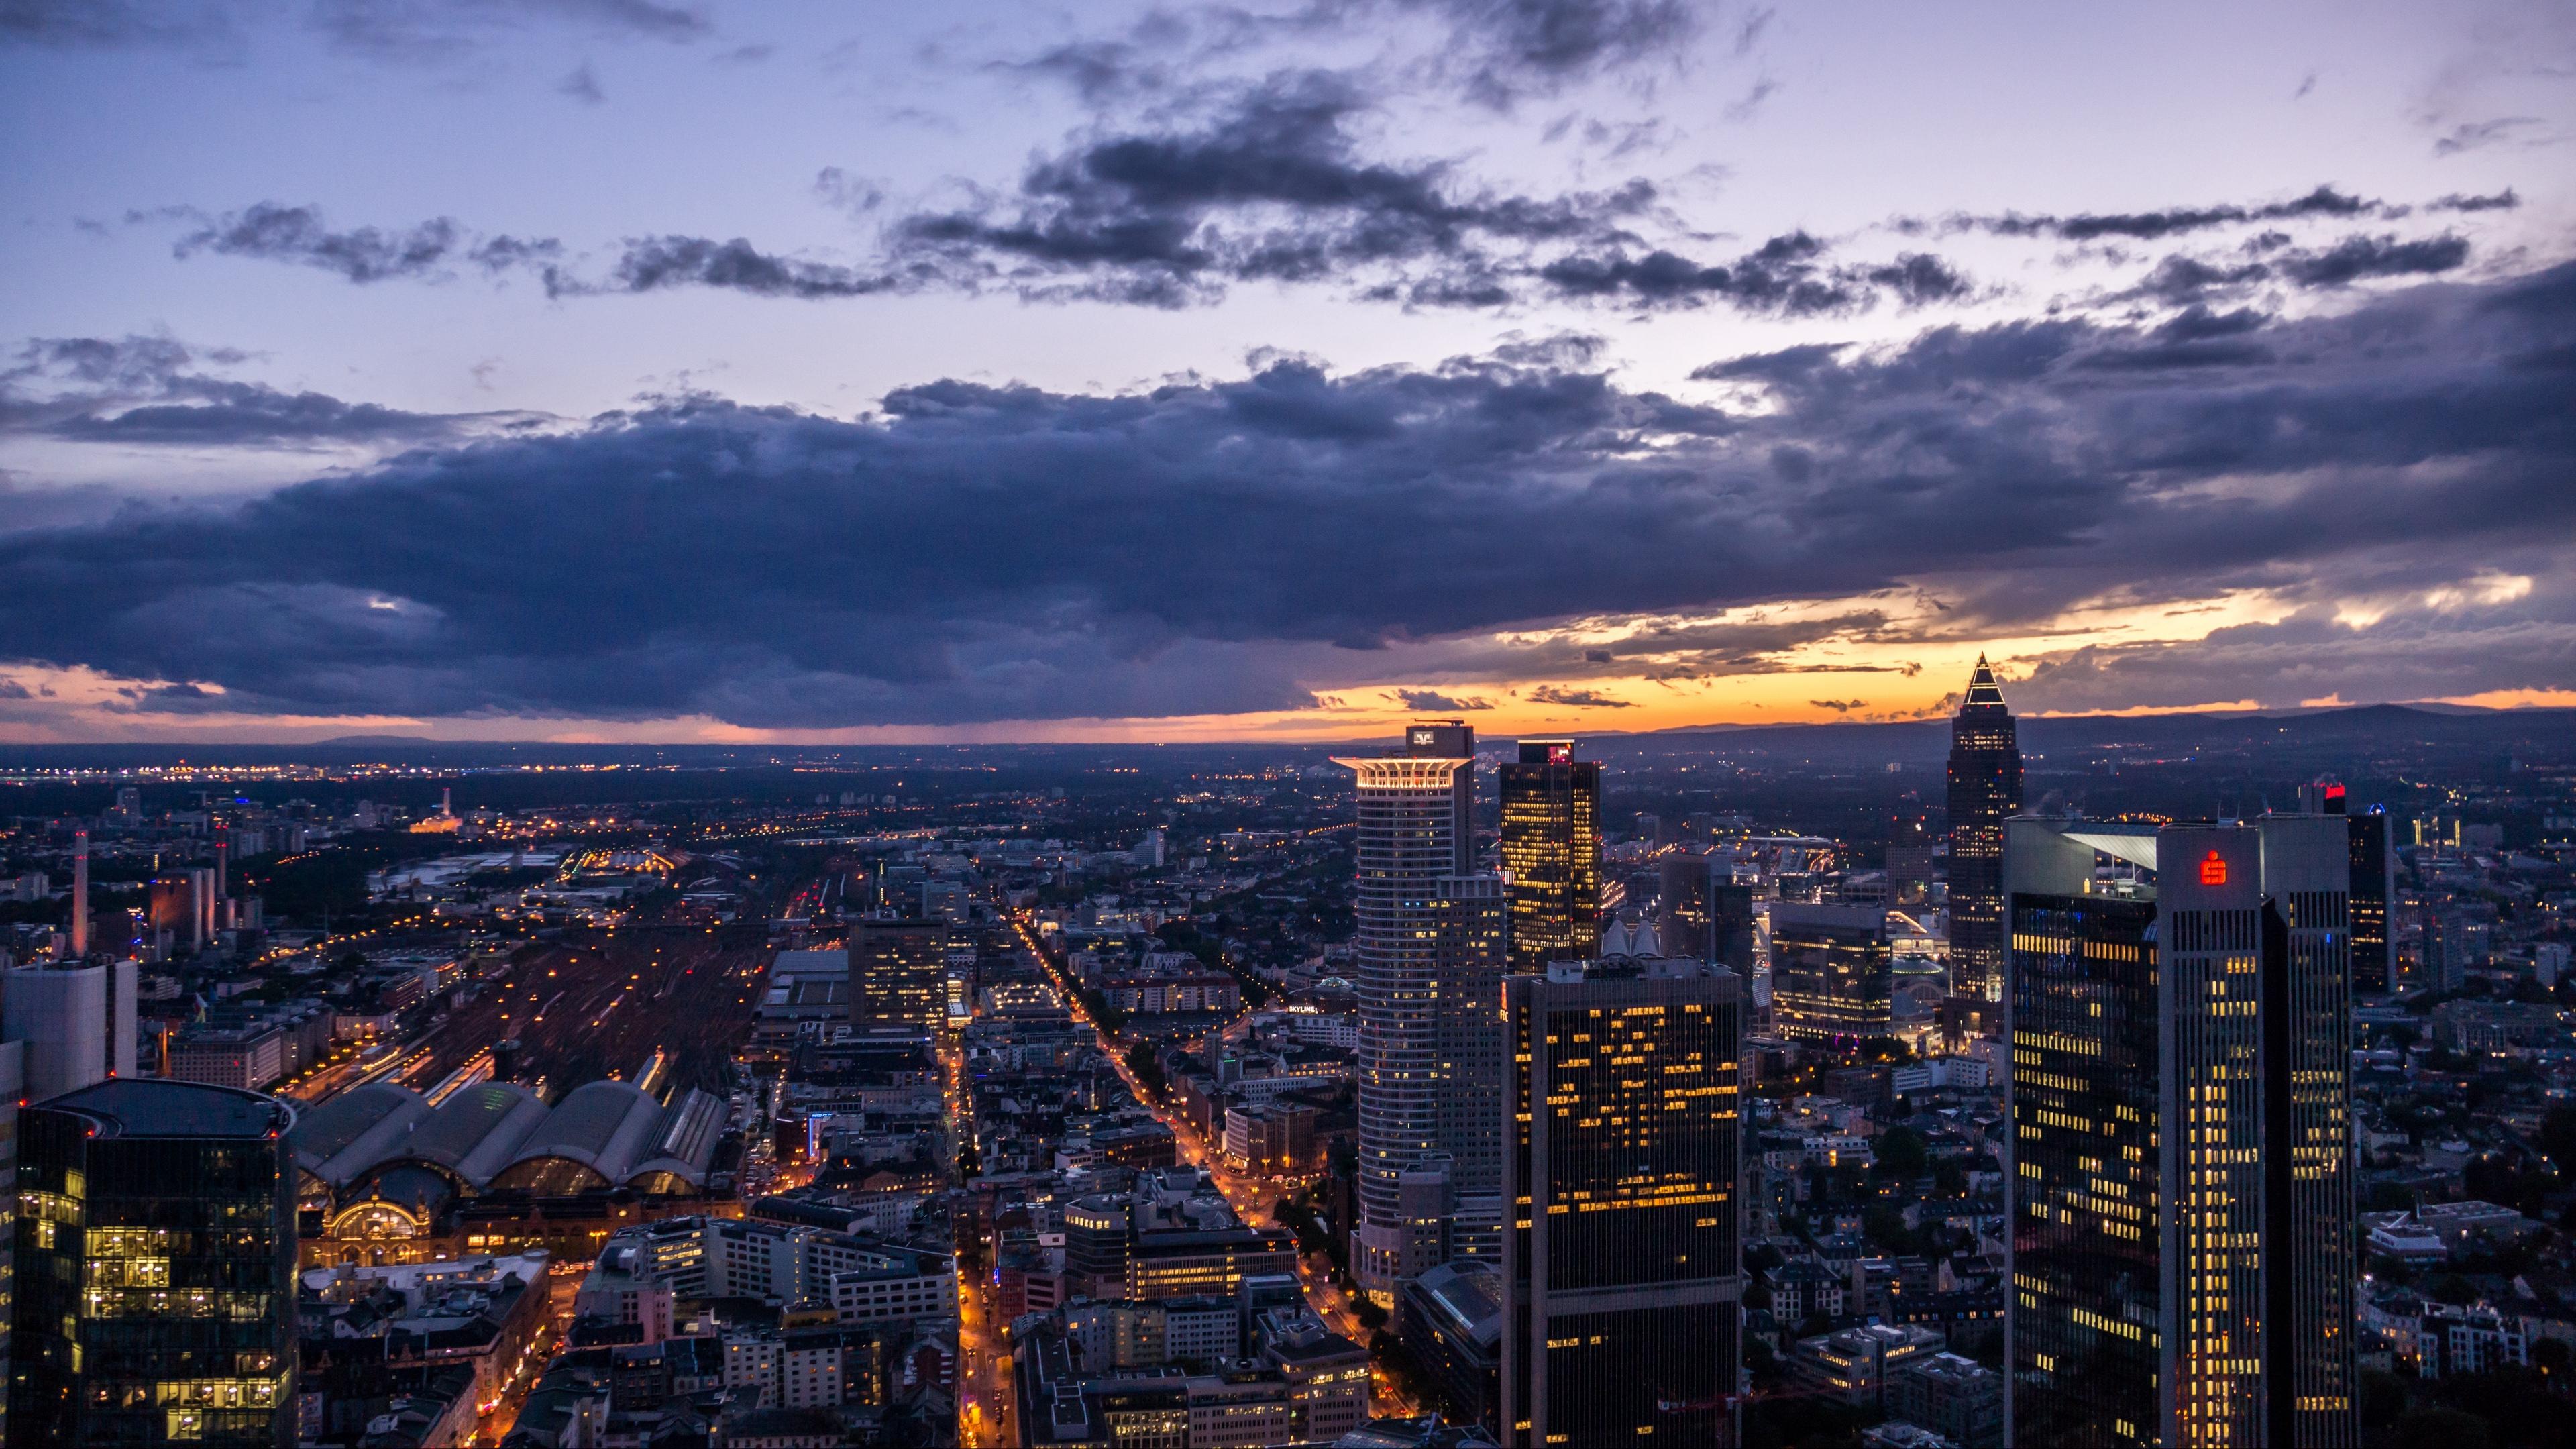 night city top view buildings 4k 1538065363 - night city, top view, buildings 4k - top view, night city, buildings